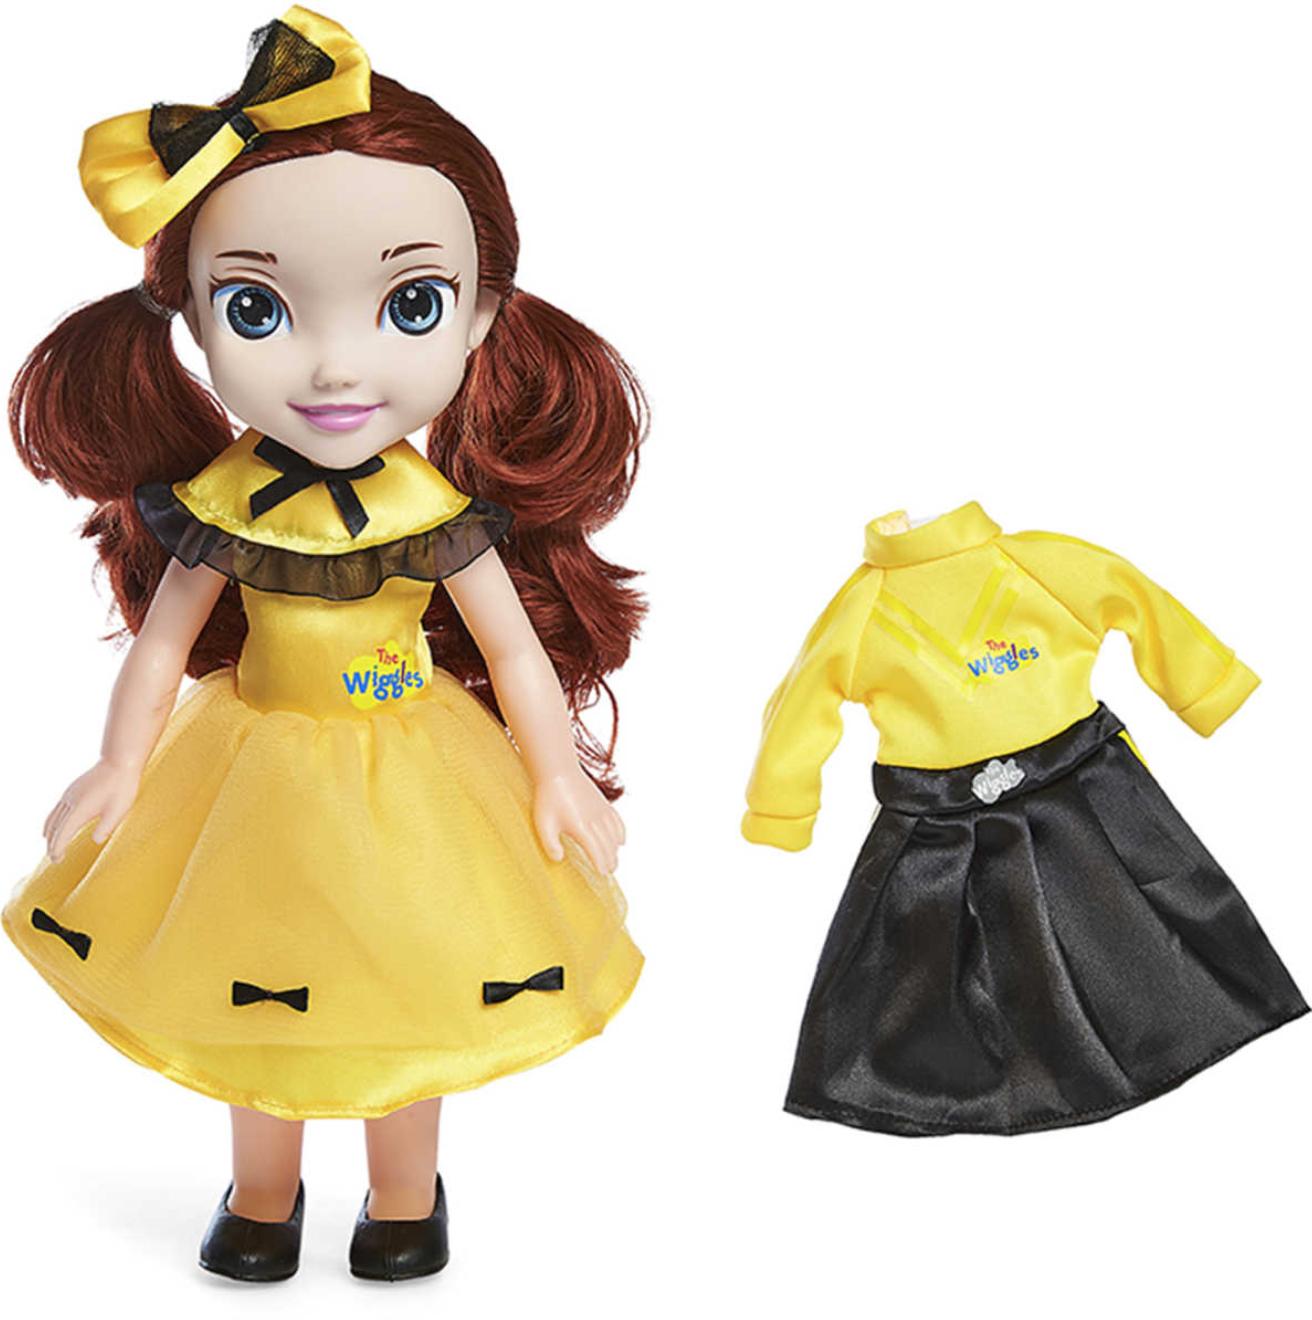 Emma Wiggle Ballerina Doll